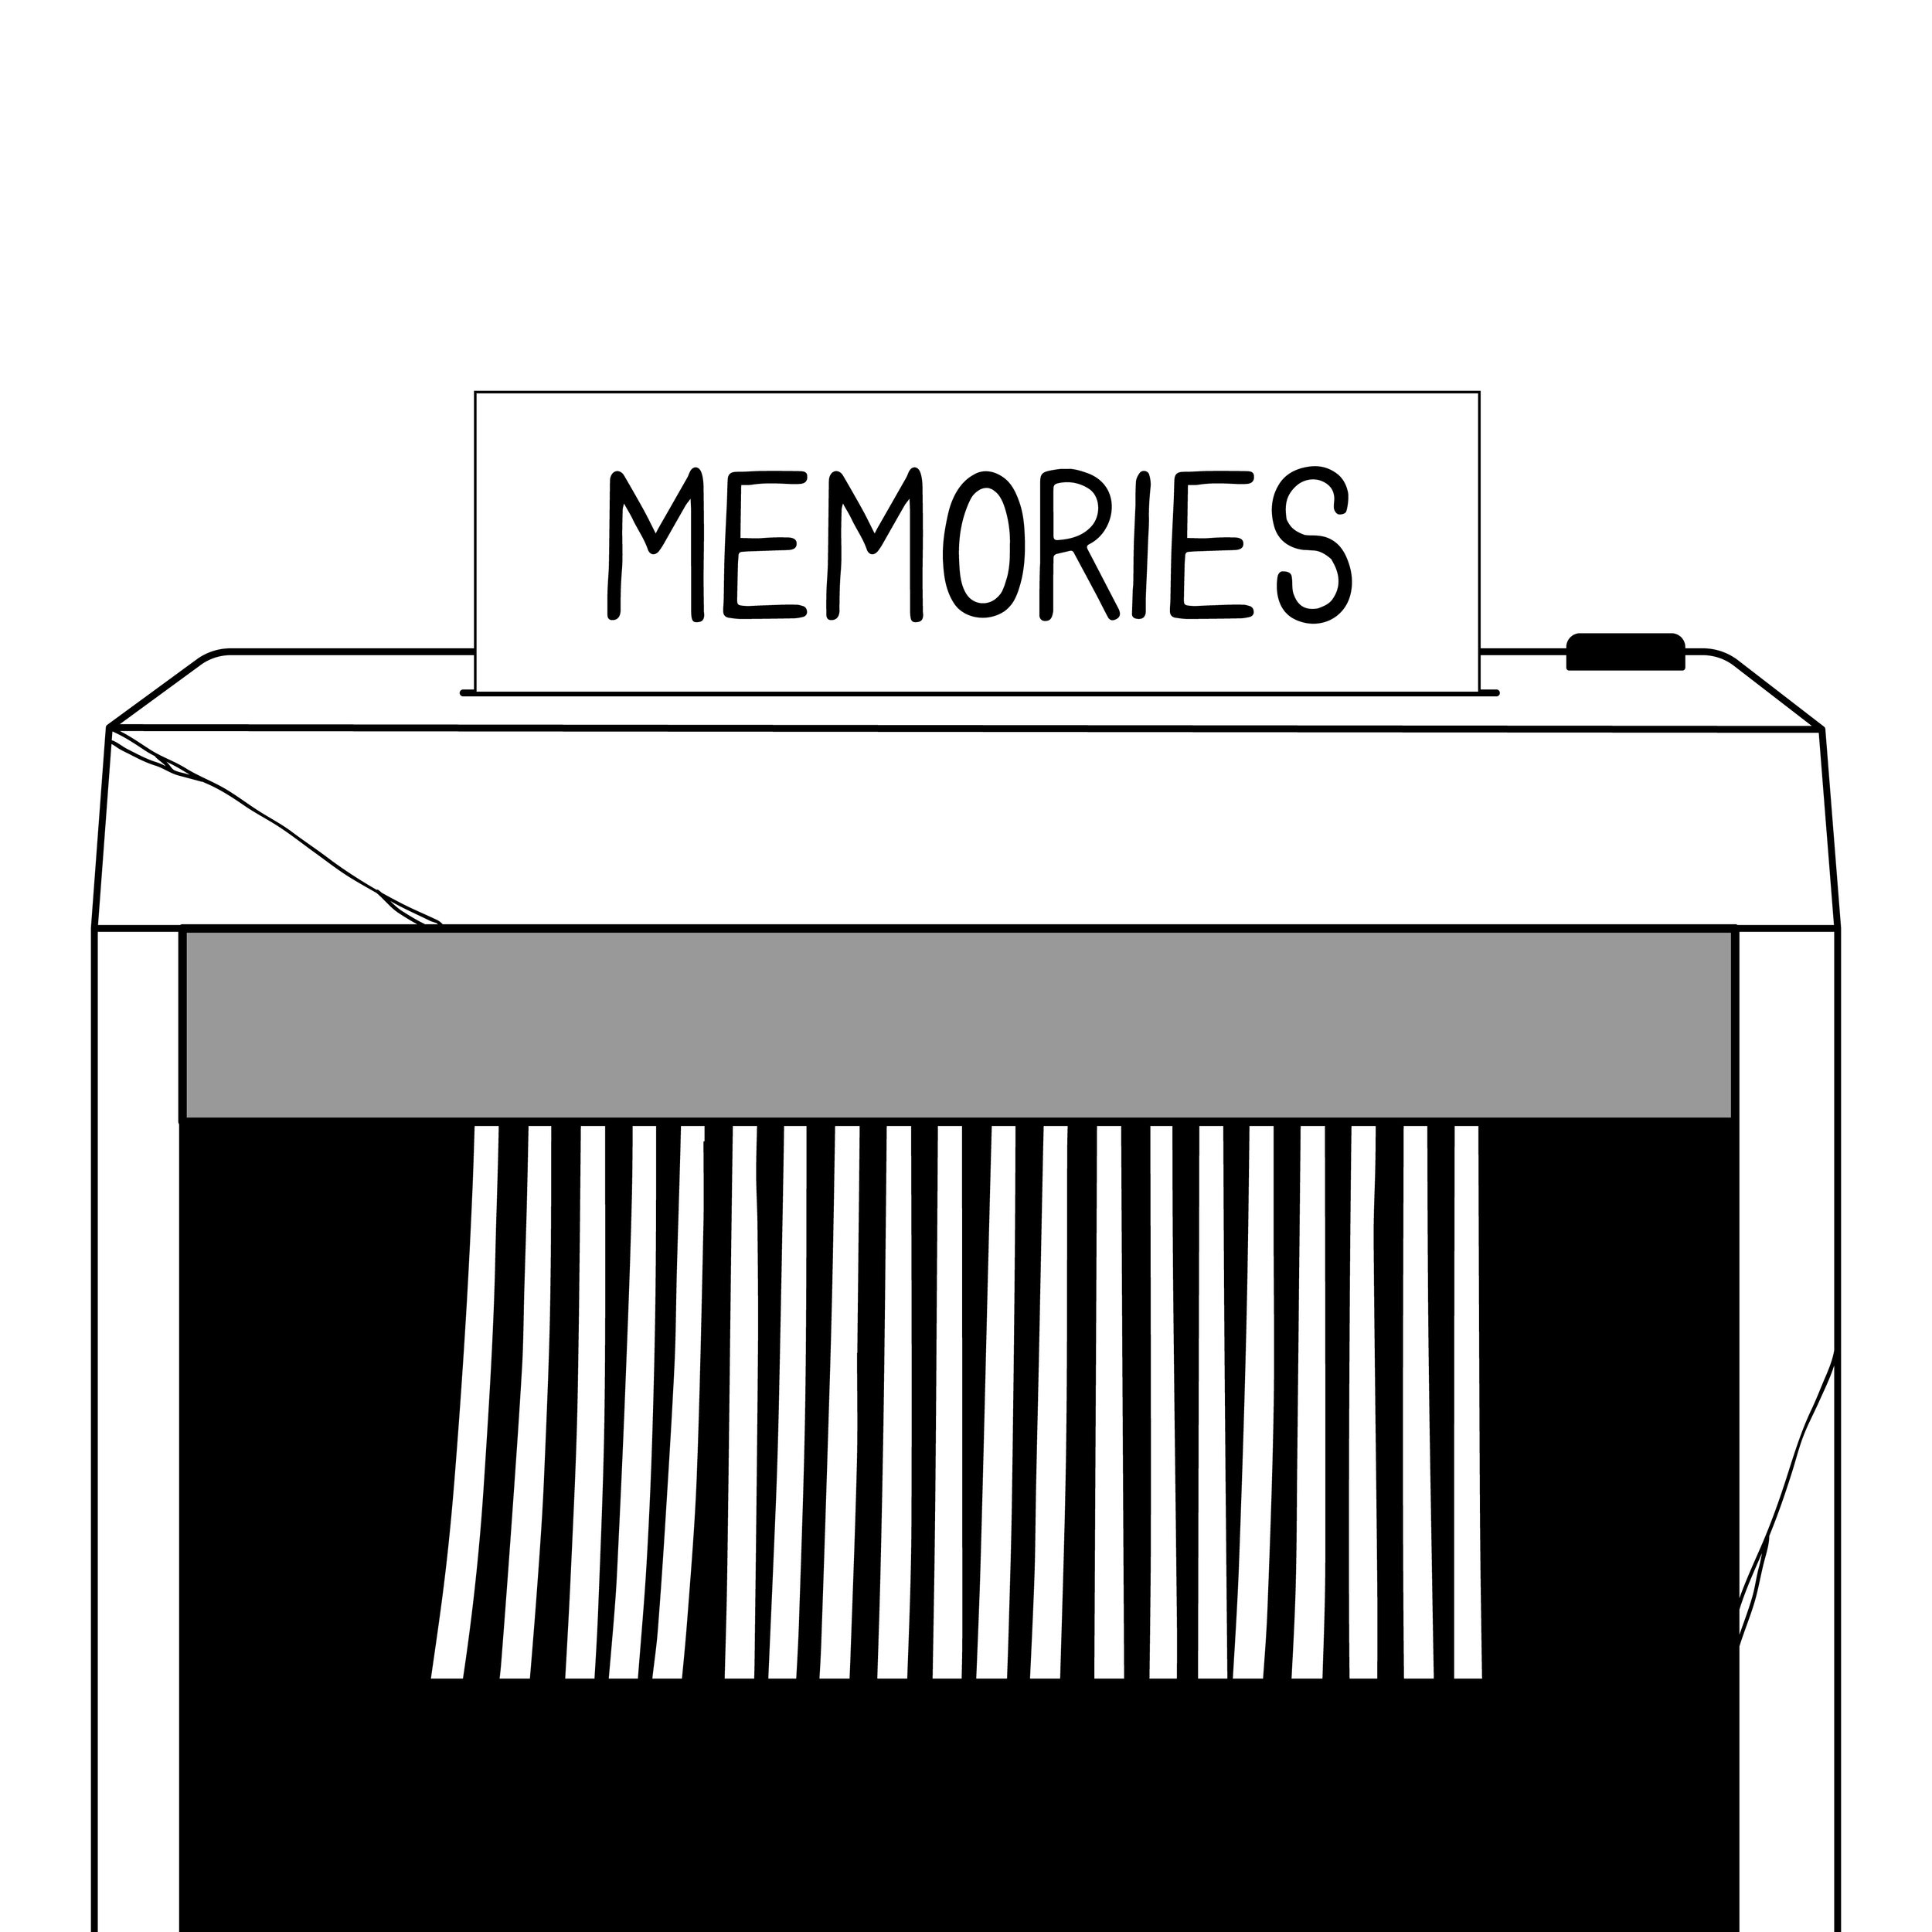 memories-01.jpg